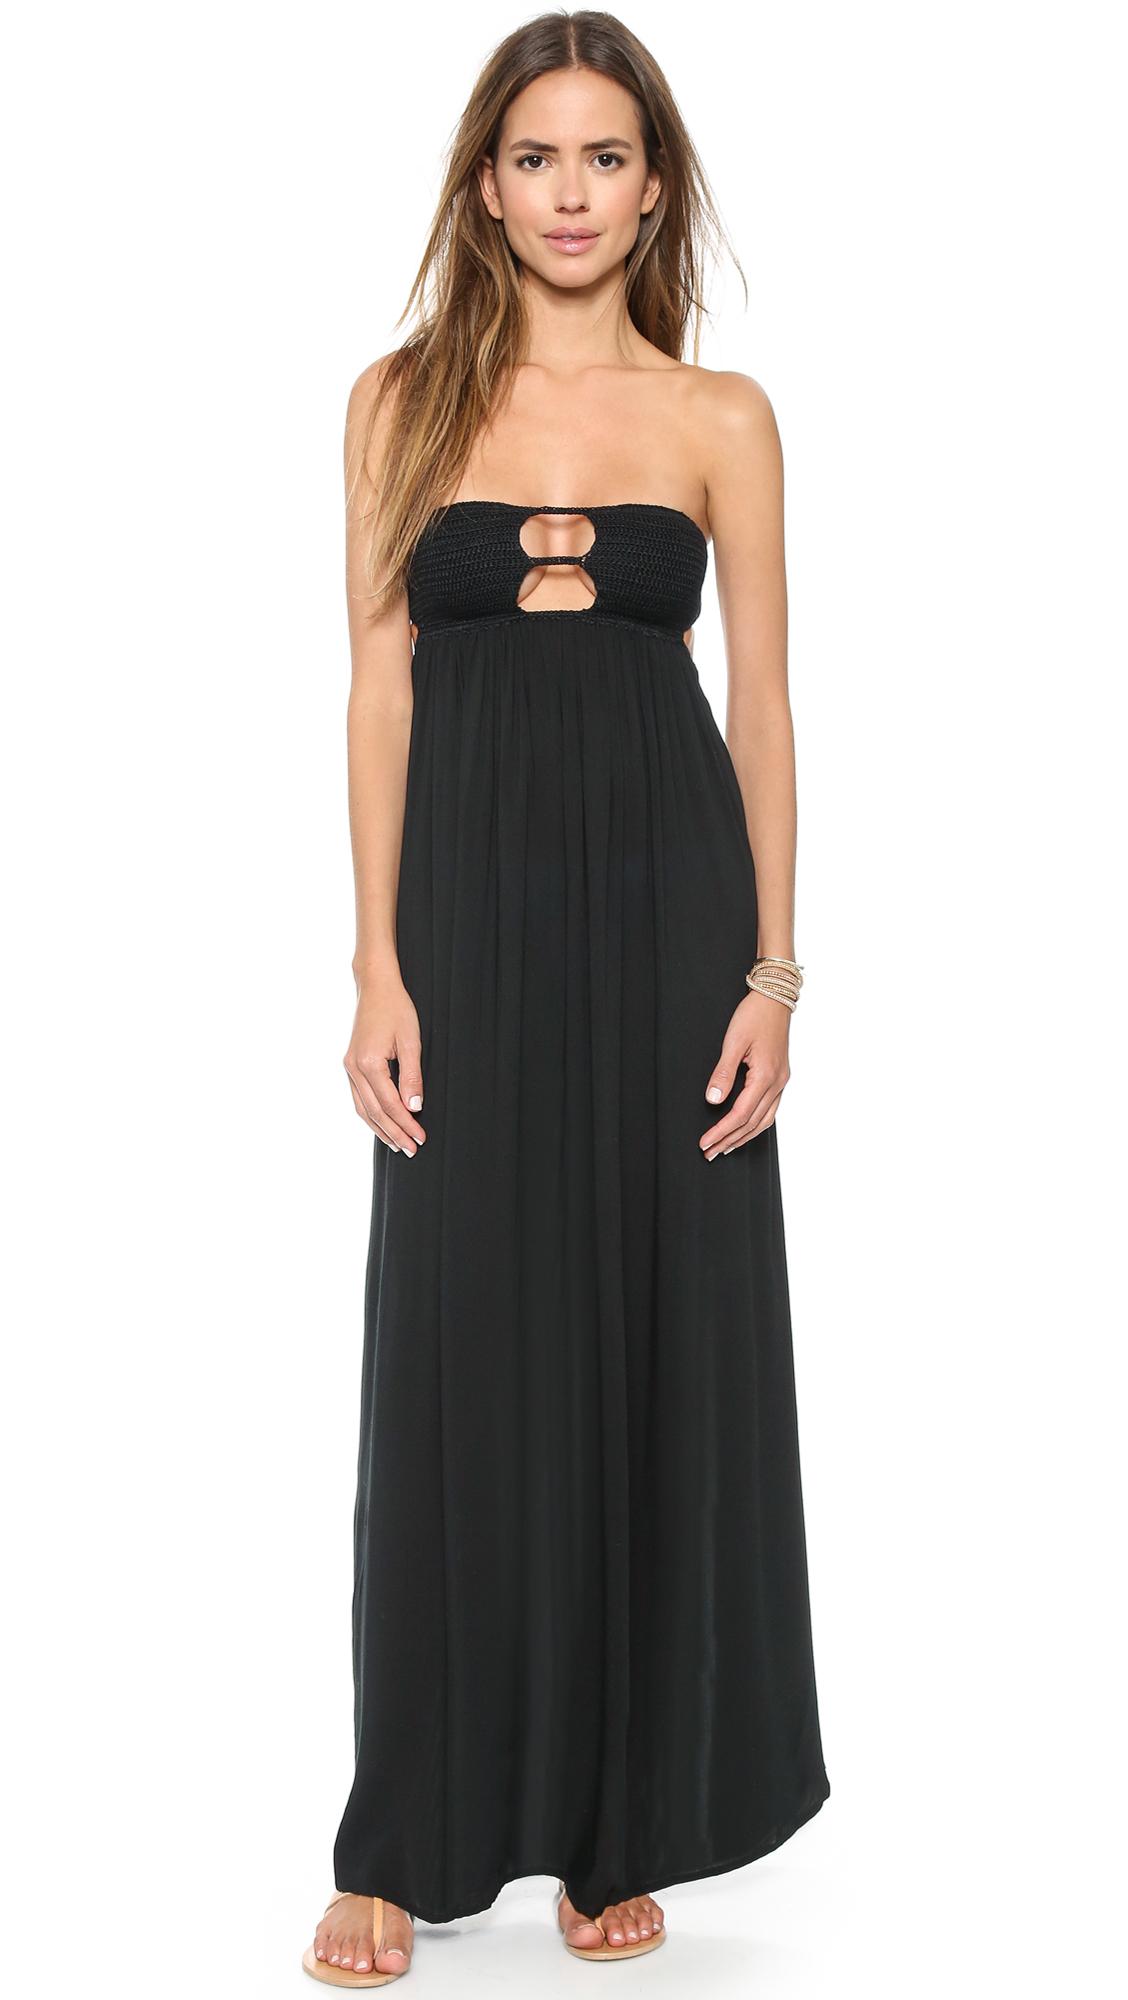 Black dress maxi - Gallery